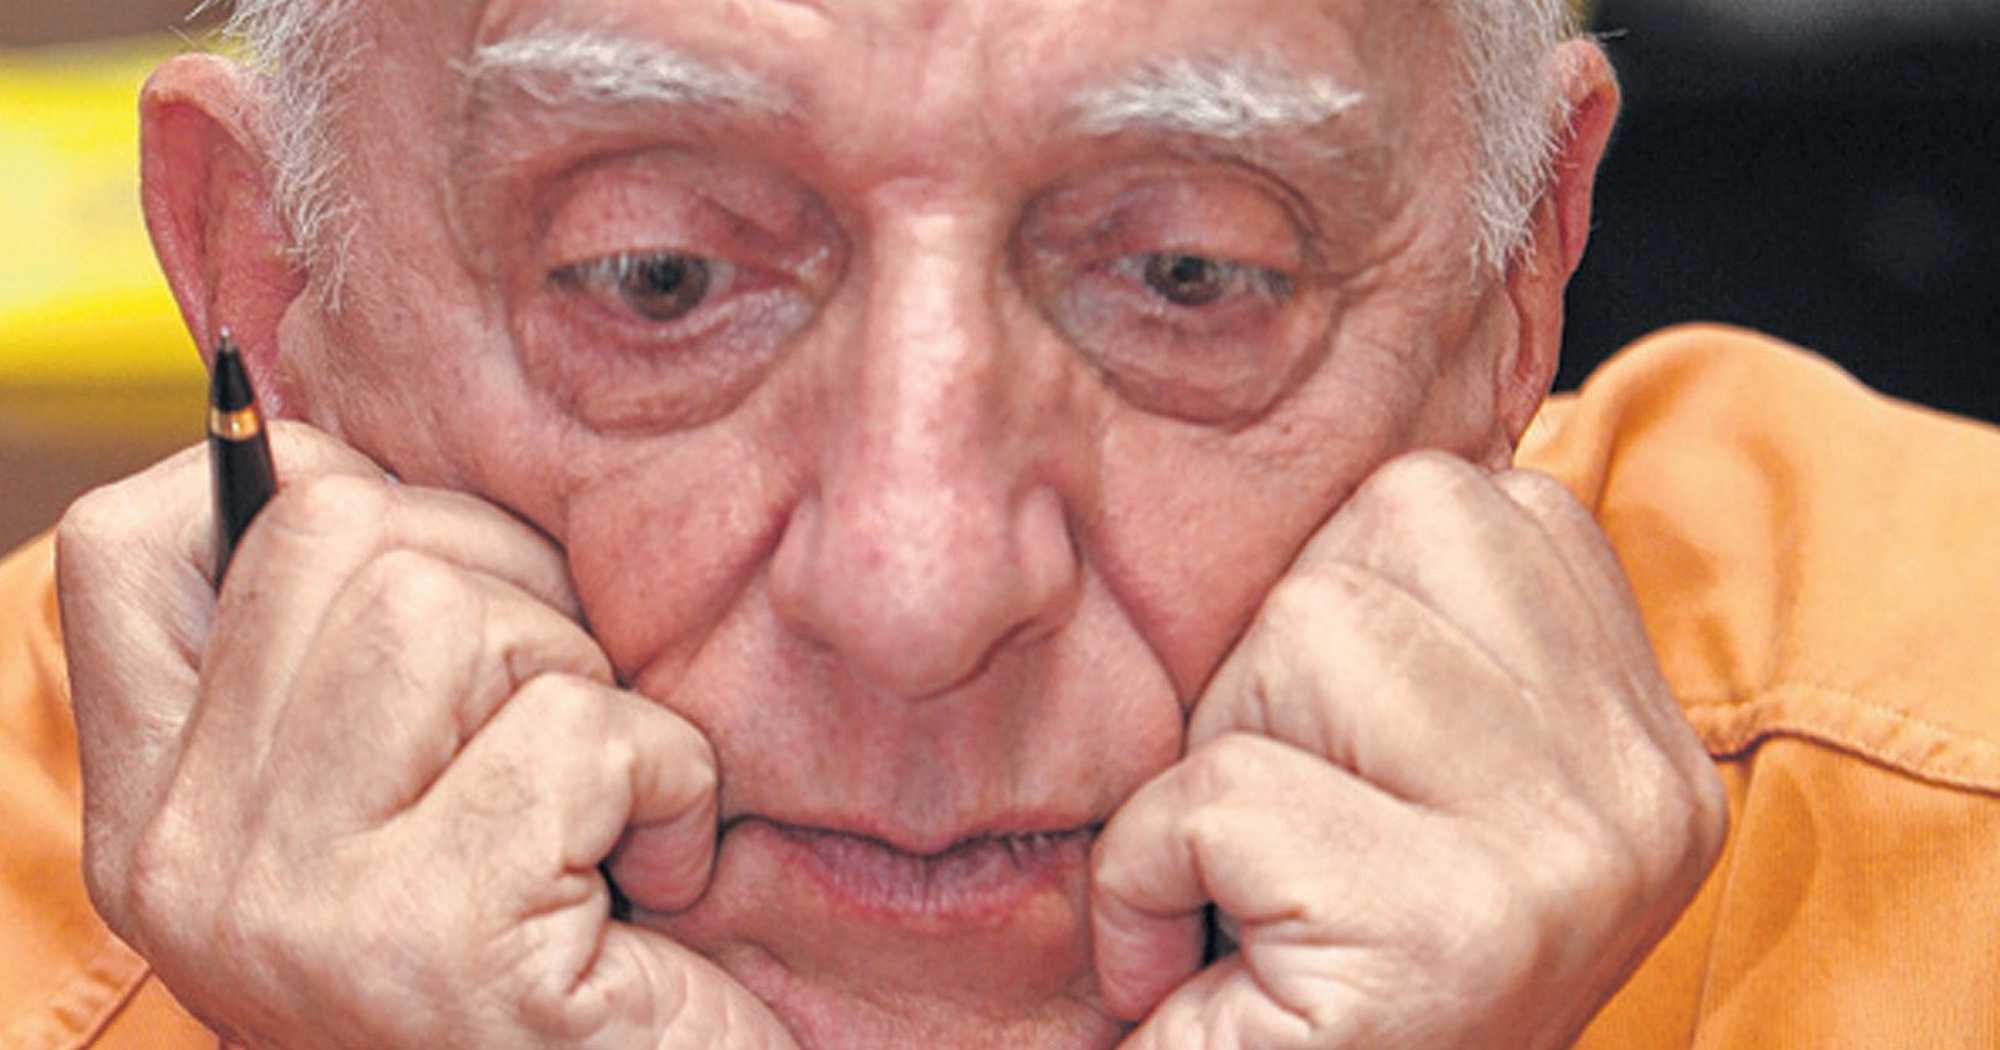 Brazilian writer and psychoanalyst Rubem Alves